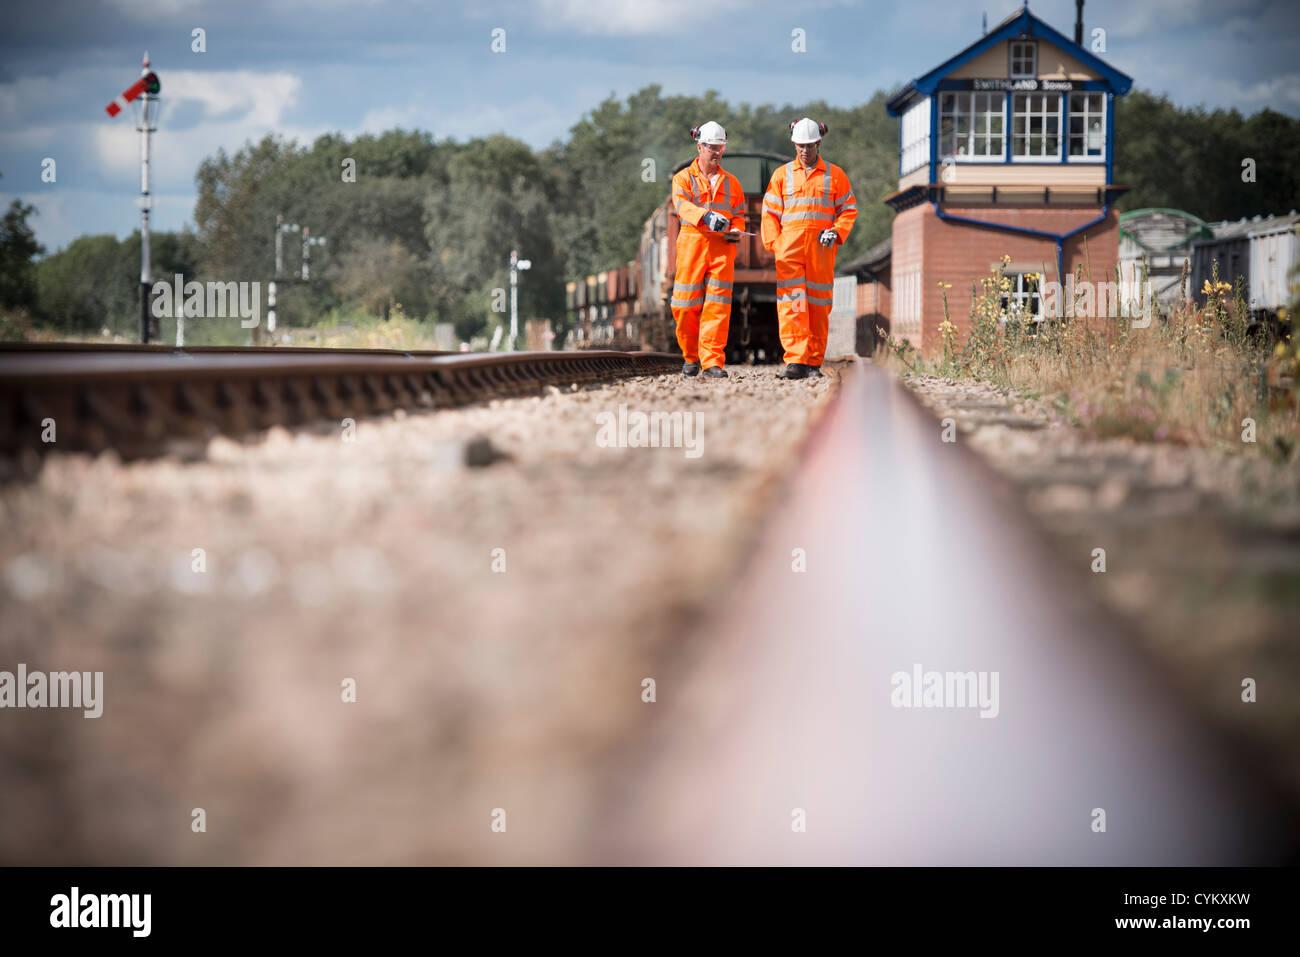 Railway workers walking on train tracks - Stock Image